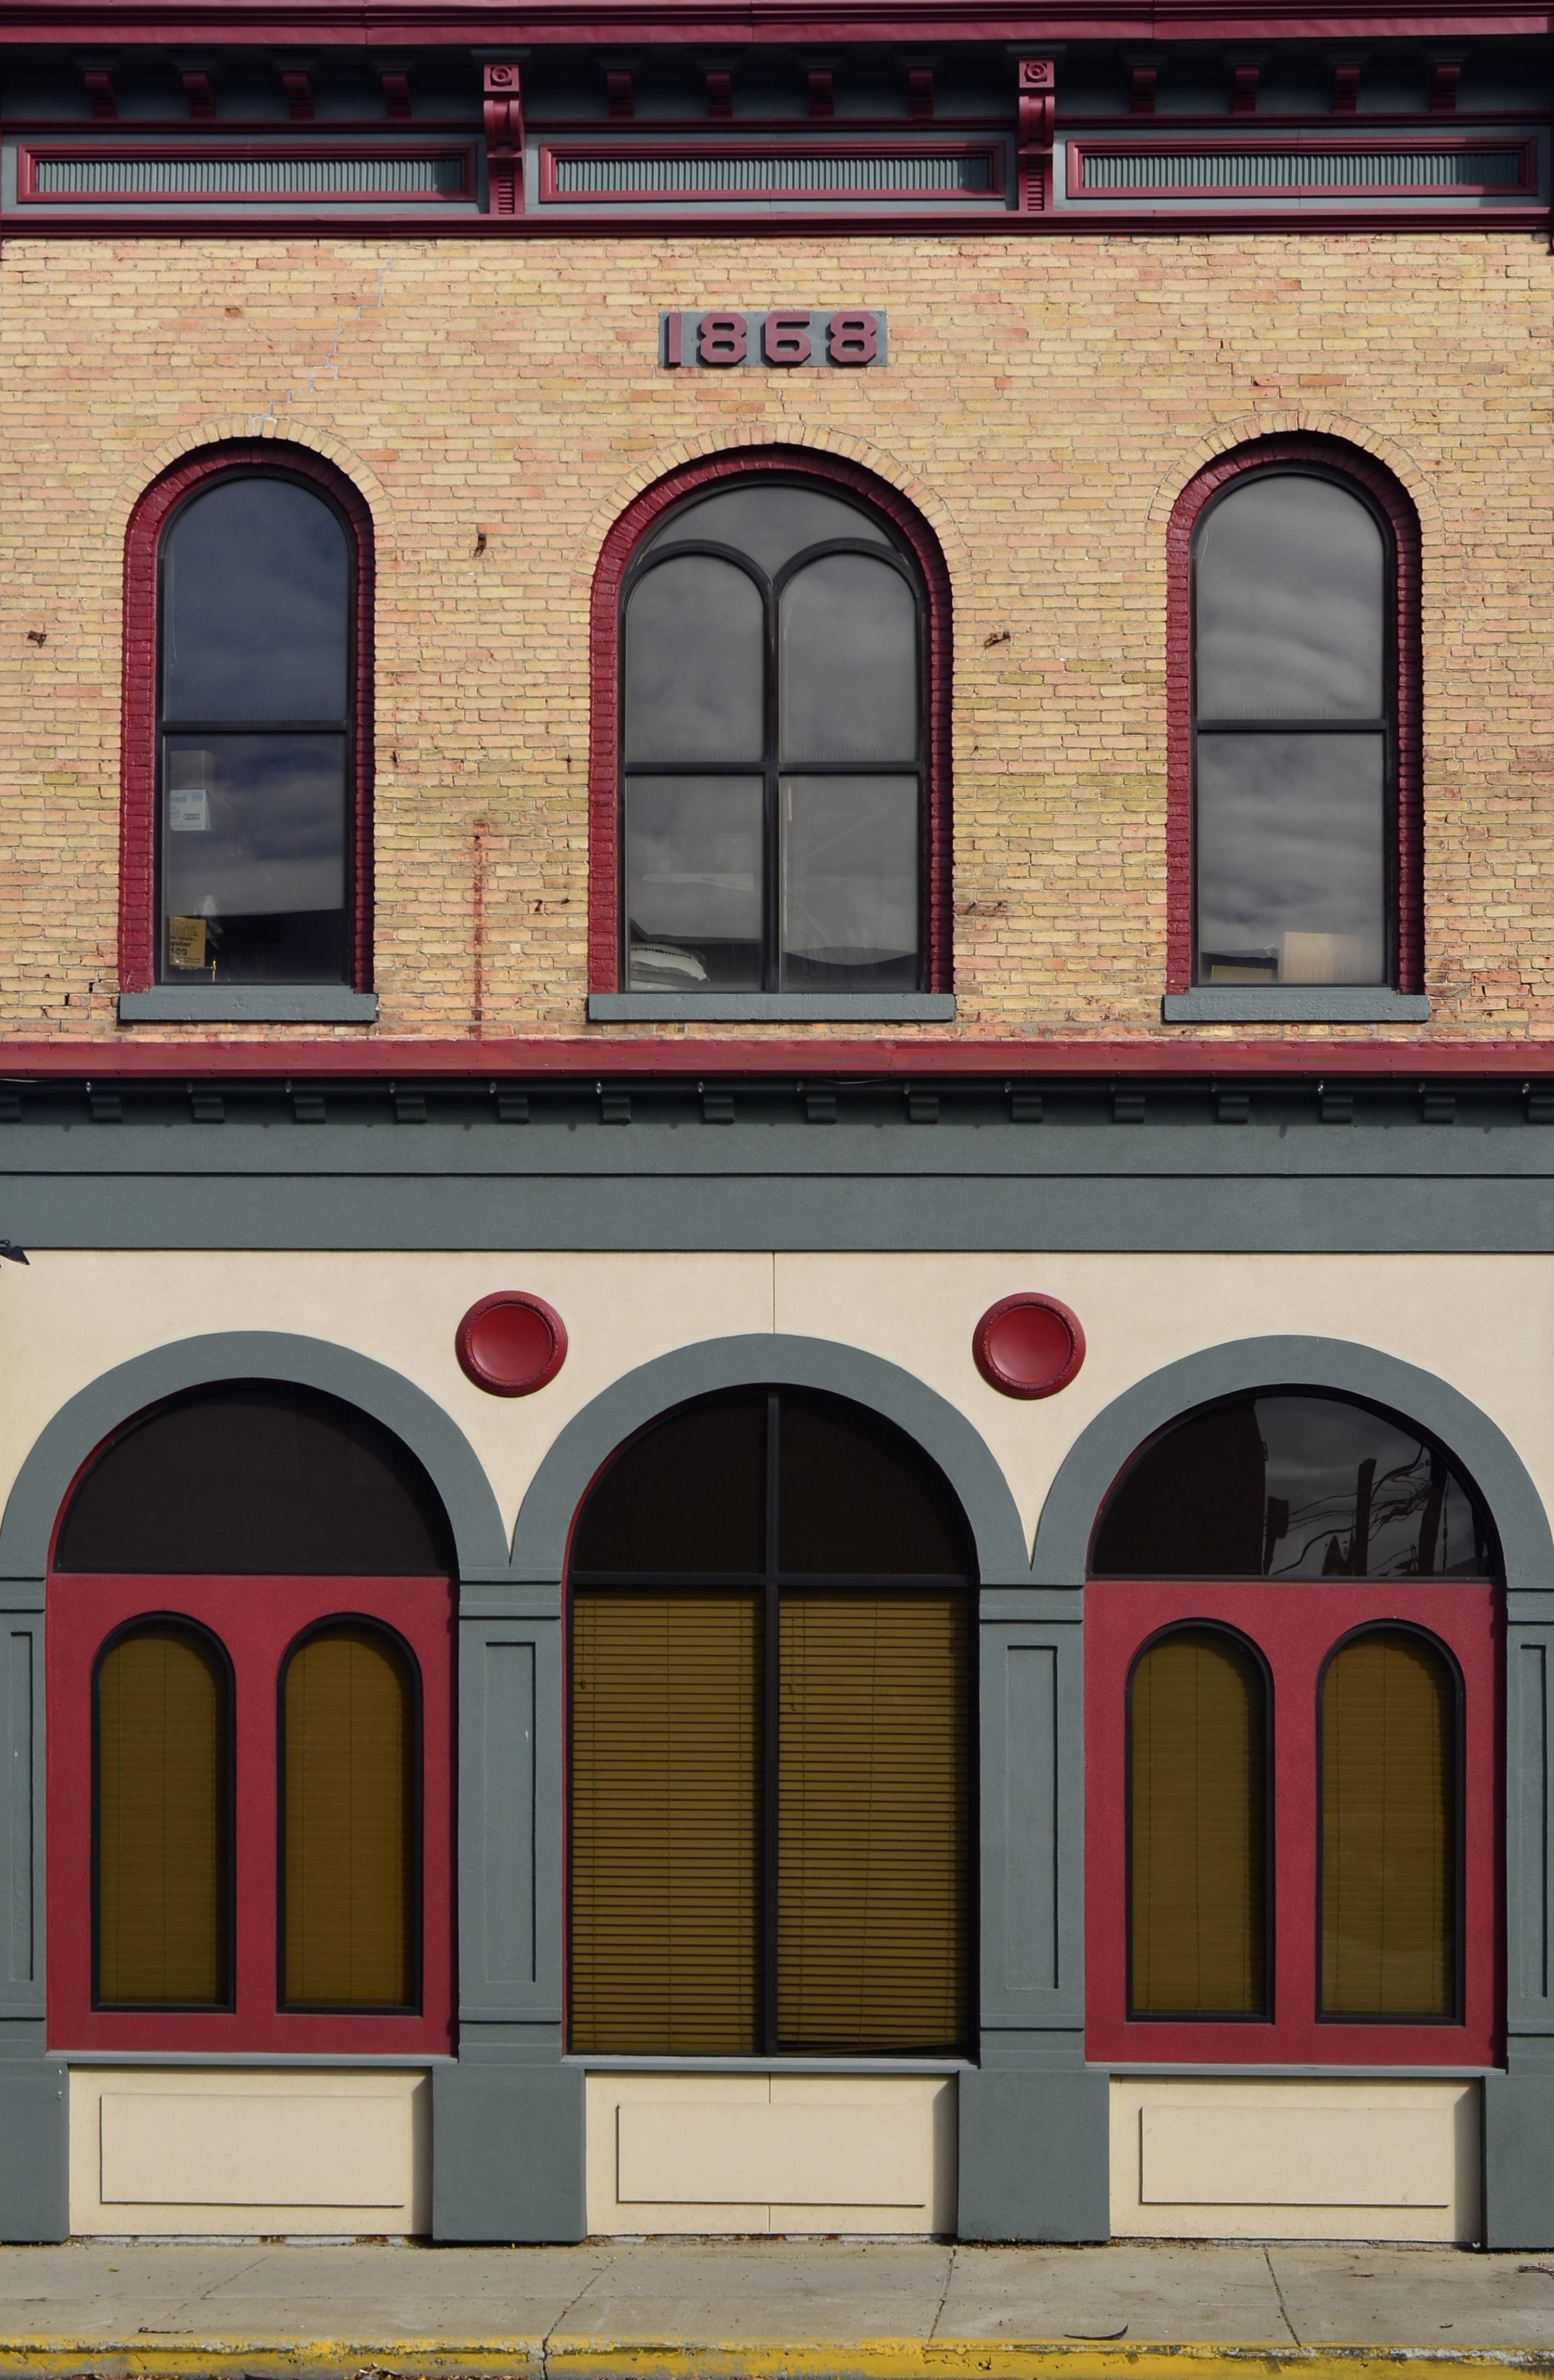 casa ventana pared arco rojo color estados unidos fachada exterior ladrillo puerta diseo de interiores